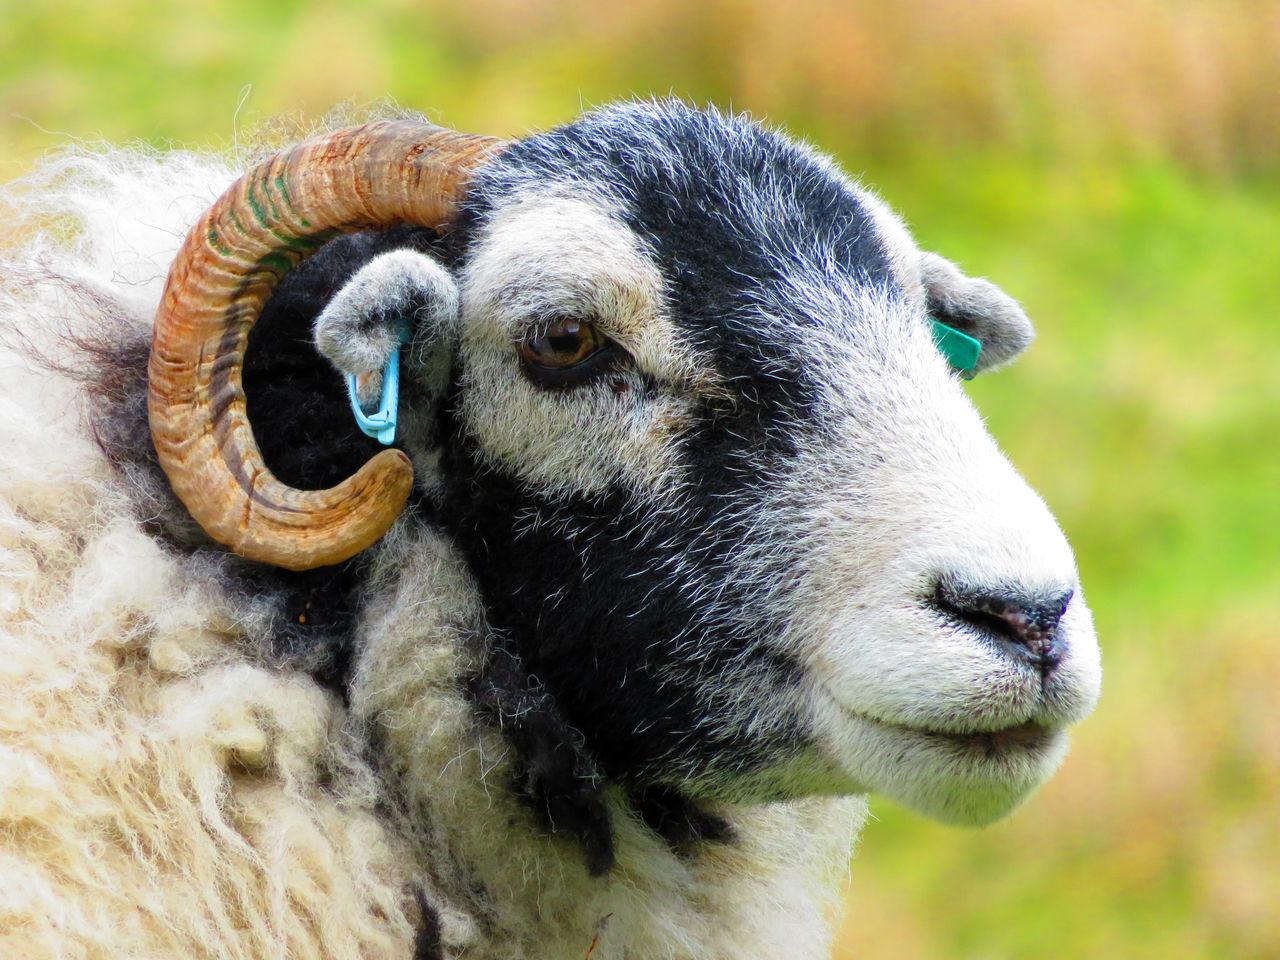 Livestock Livestock Tag Looking At Camera Sheep Yorkshire Dales Yorkshiredales Sheeps Sheep Farm Sheep🐑 Sheep Meadow Farm Animals EyeEm Animal Lover EyeEm Best Shots EyeEmBestPics Sheepfarm Farm Animal Farm Animal Close Up Sheep And Lambs Yorkshire Farm Life Animal Head  Animal Photography Farmanimals EyeEm Sheep Ranch